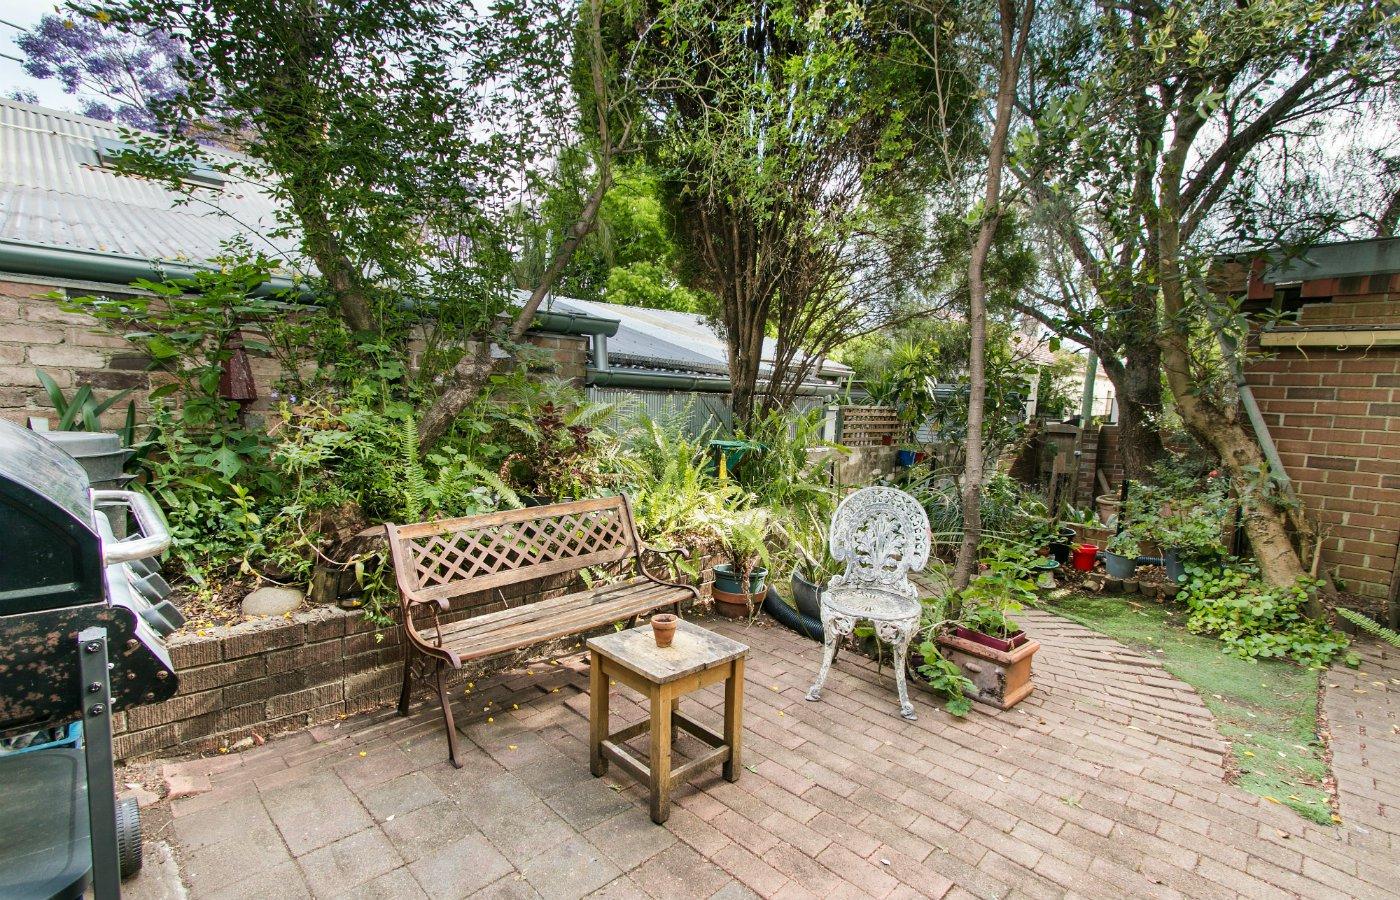 Home improvement spending 2018 garden.jpg